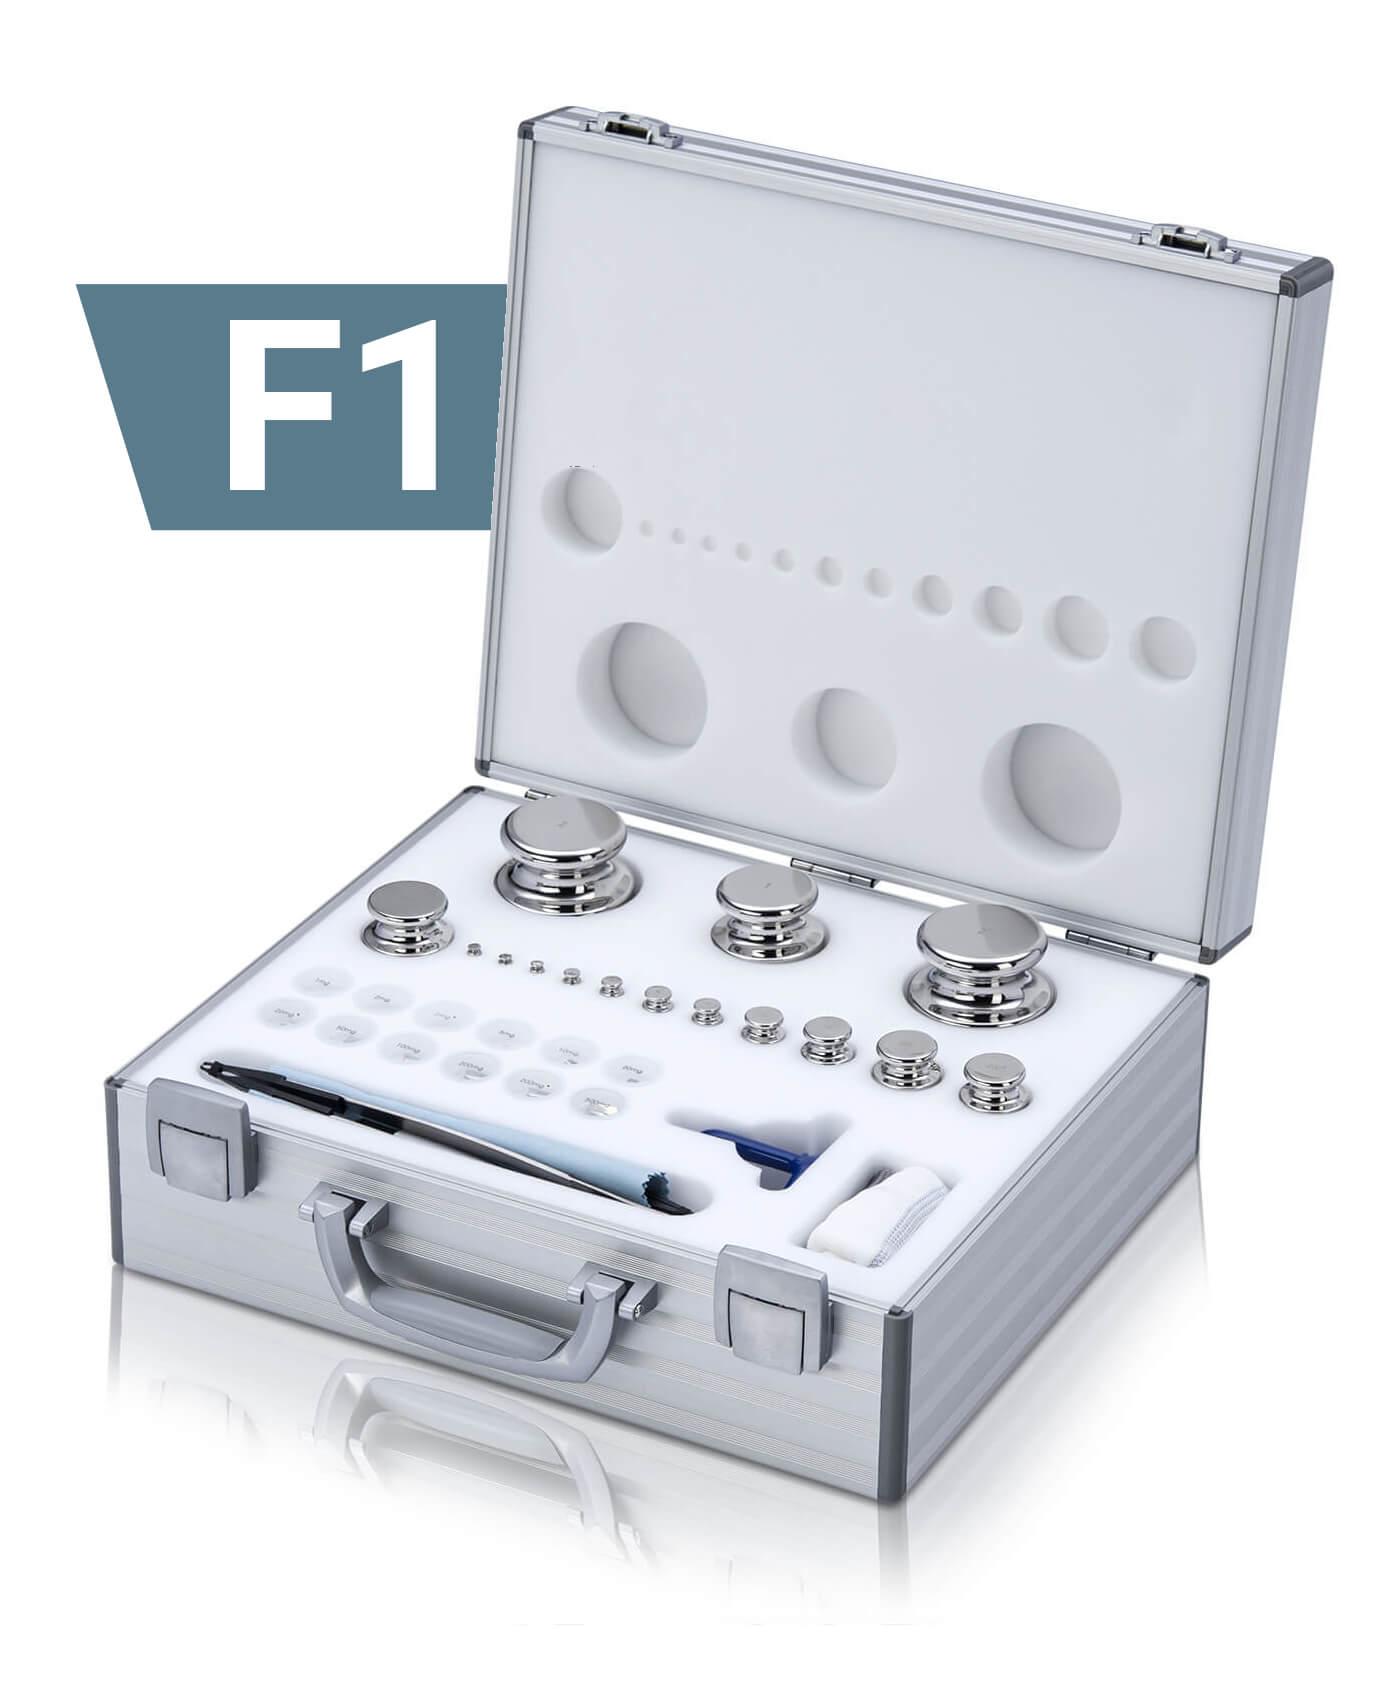 F1 Knob weight set